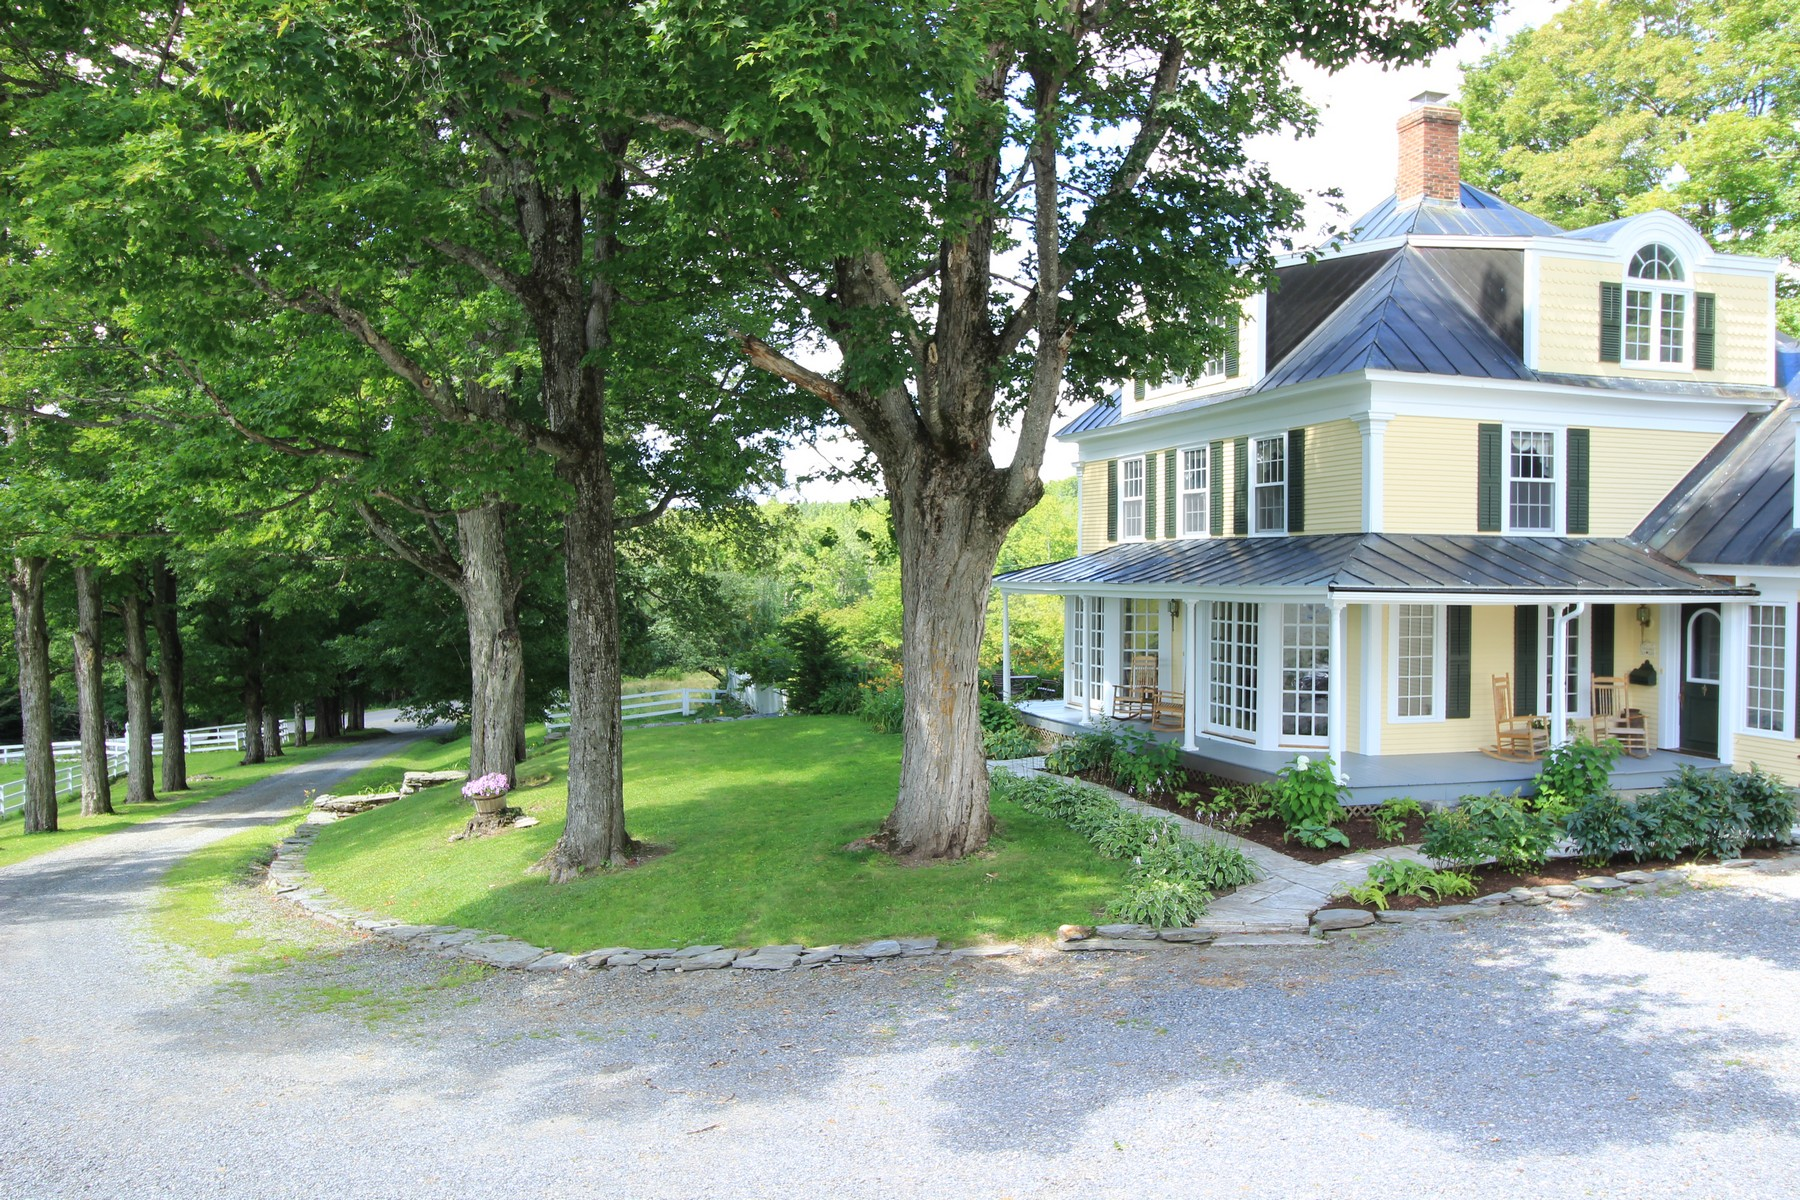 Casa Unifamiliar por un Venta en 77 Maple Lane, Glover 77 Maple Ln Glover, Vermont 05875 Estados Unidos